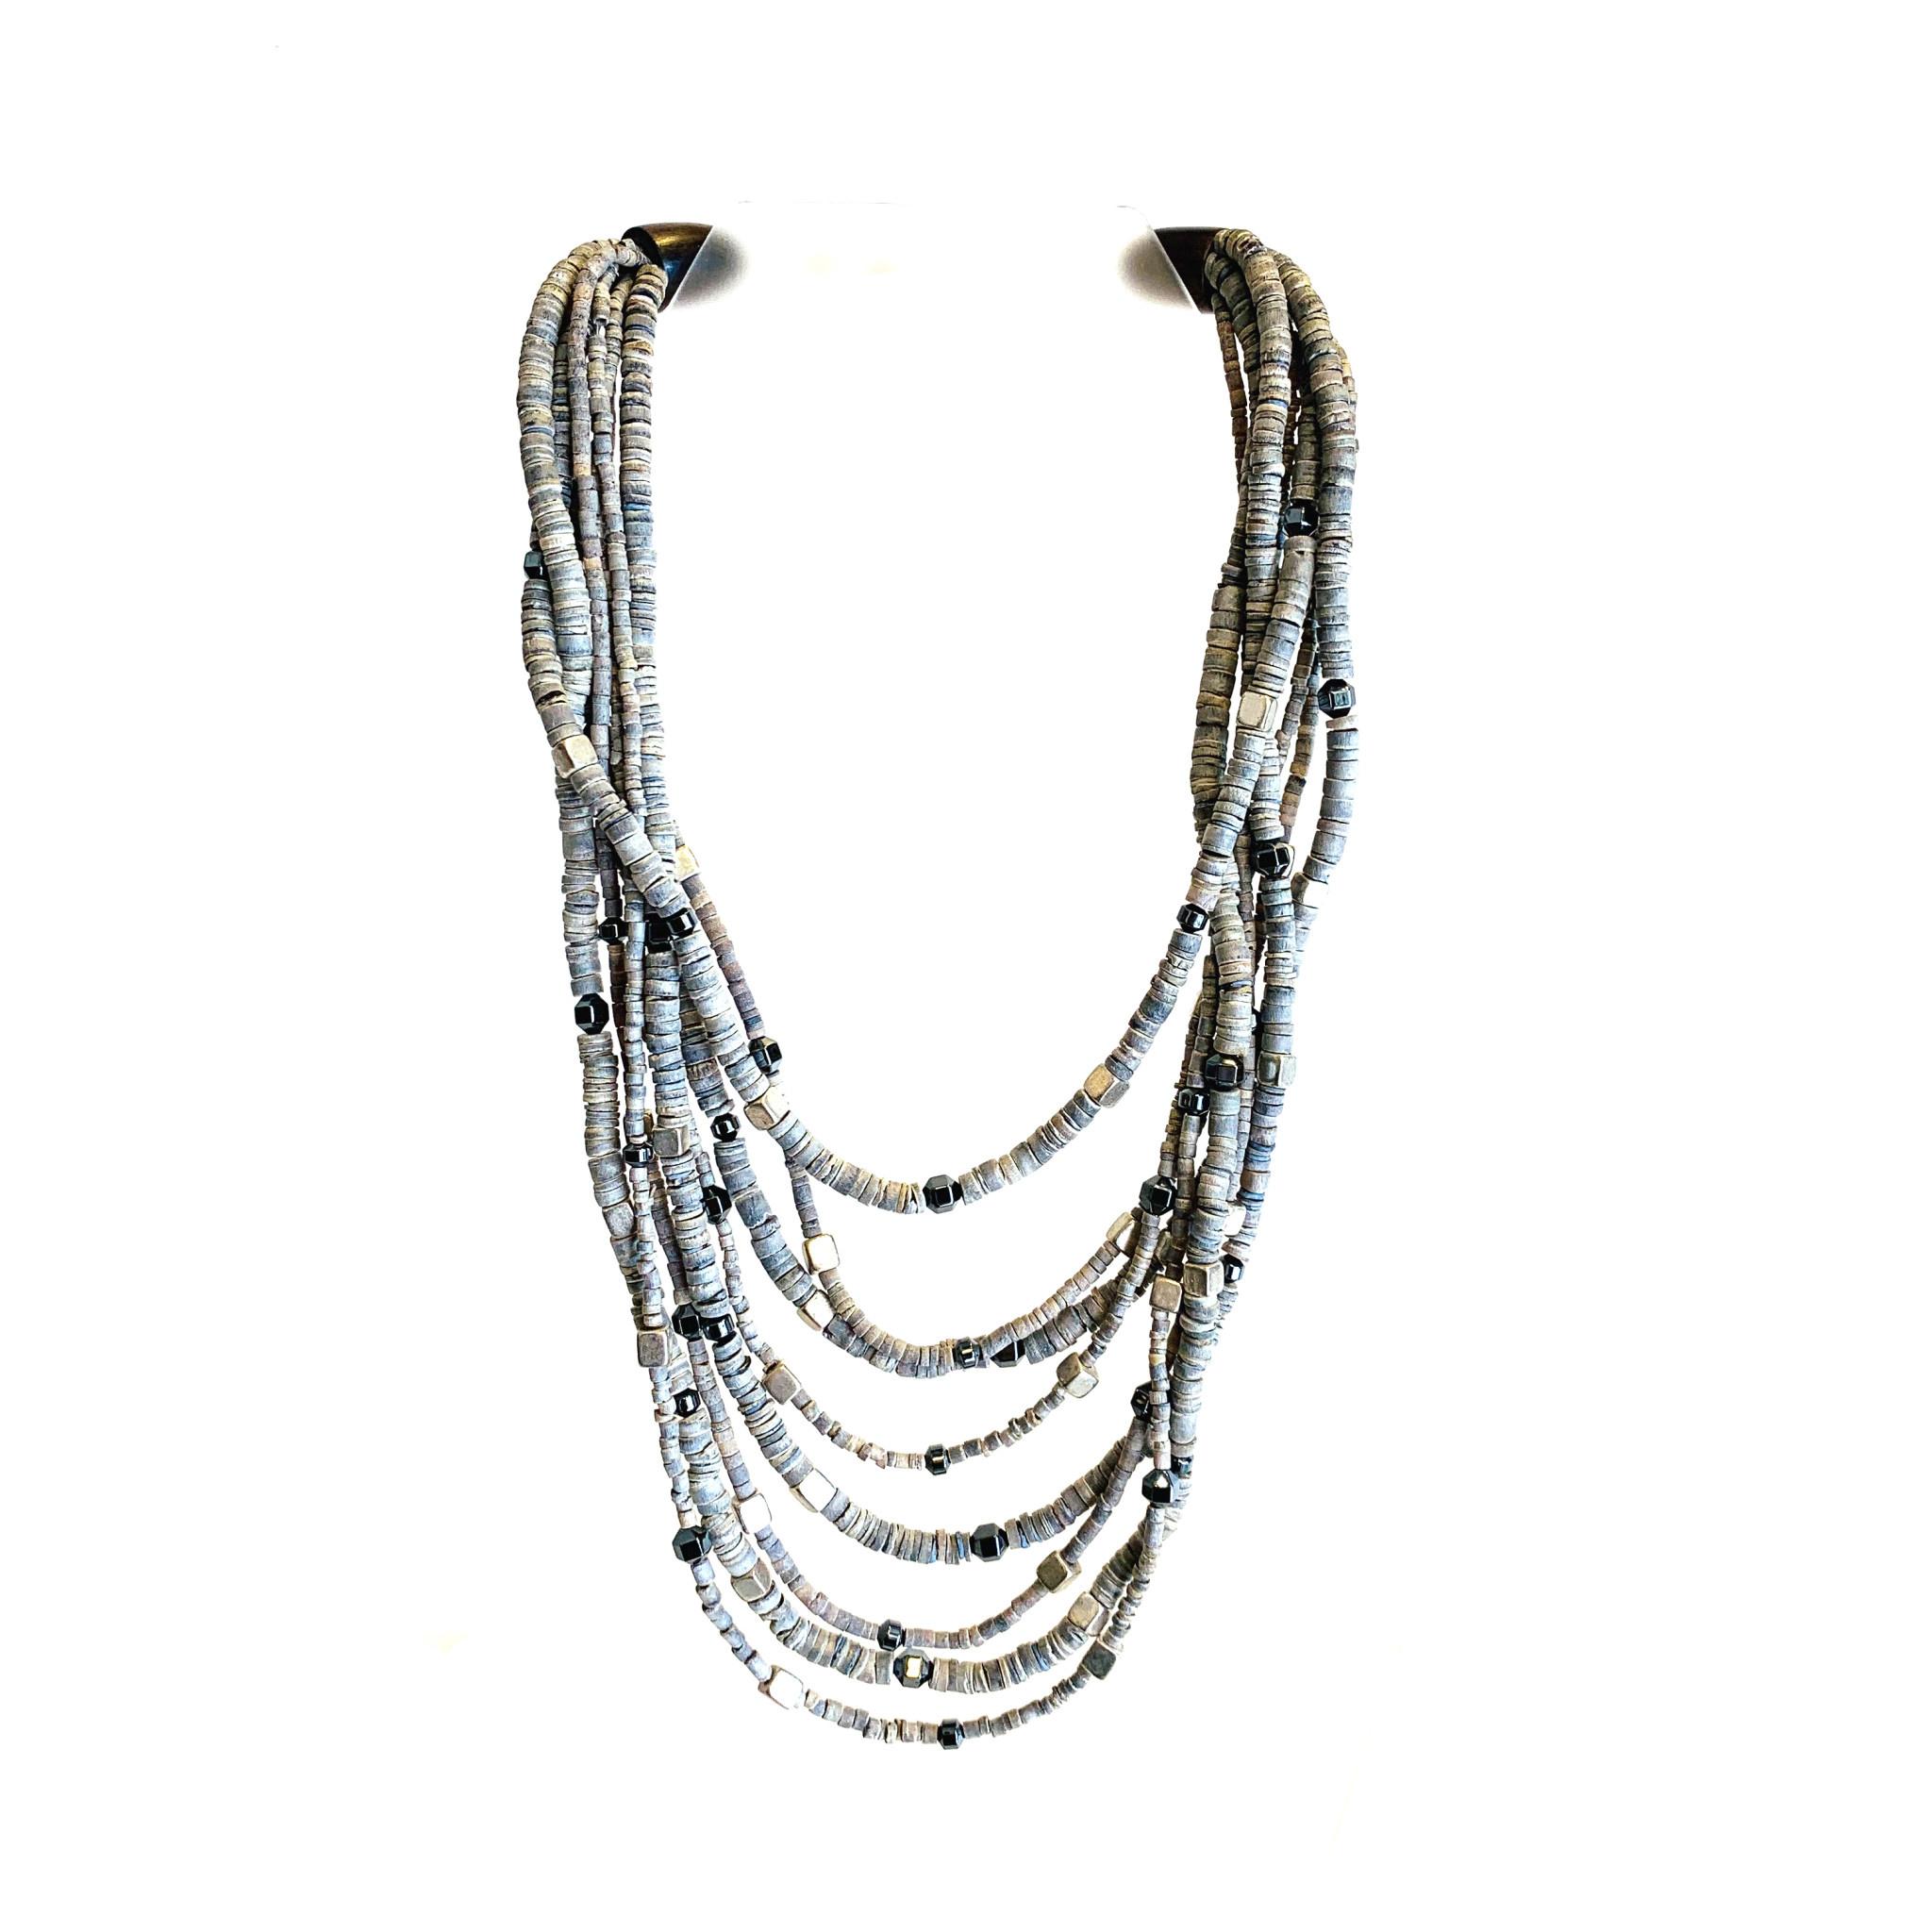 Escape From Paris Escape From Paris Thin Stranded Necklace